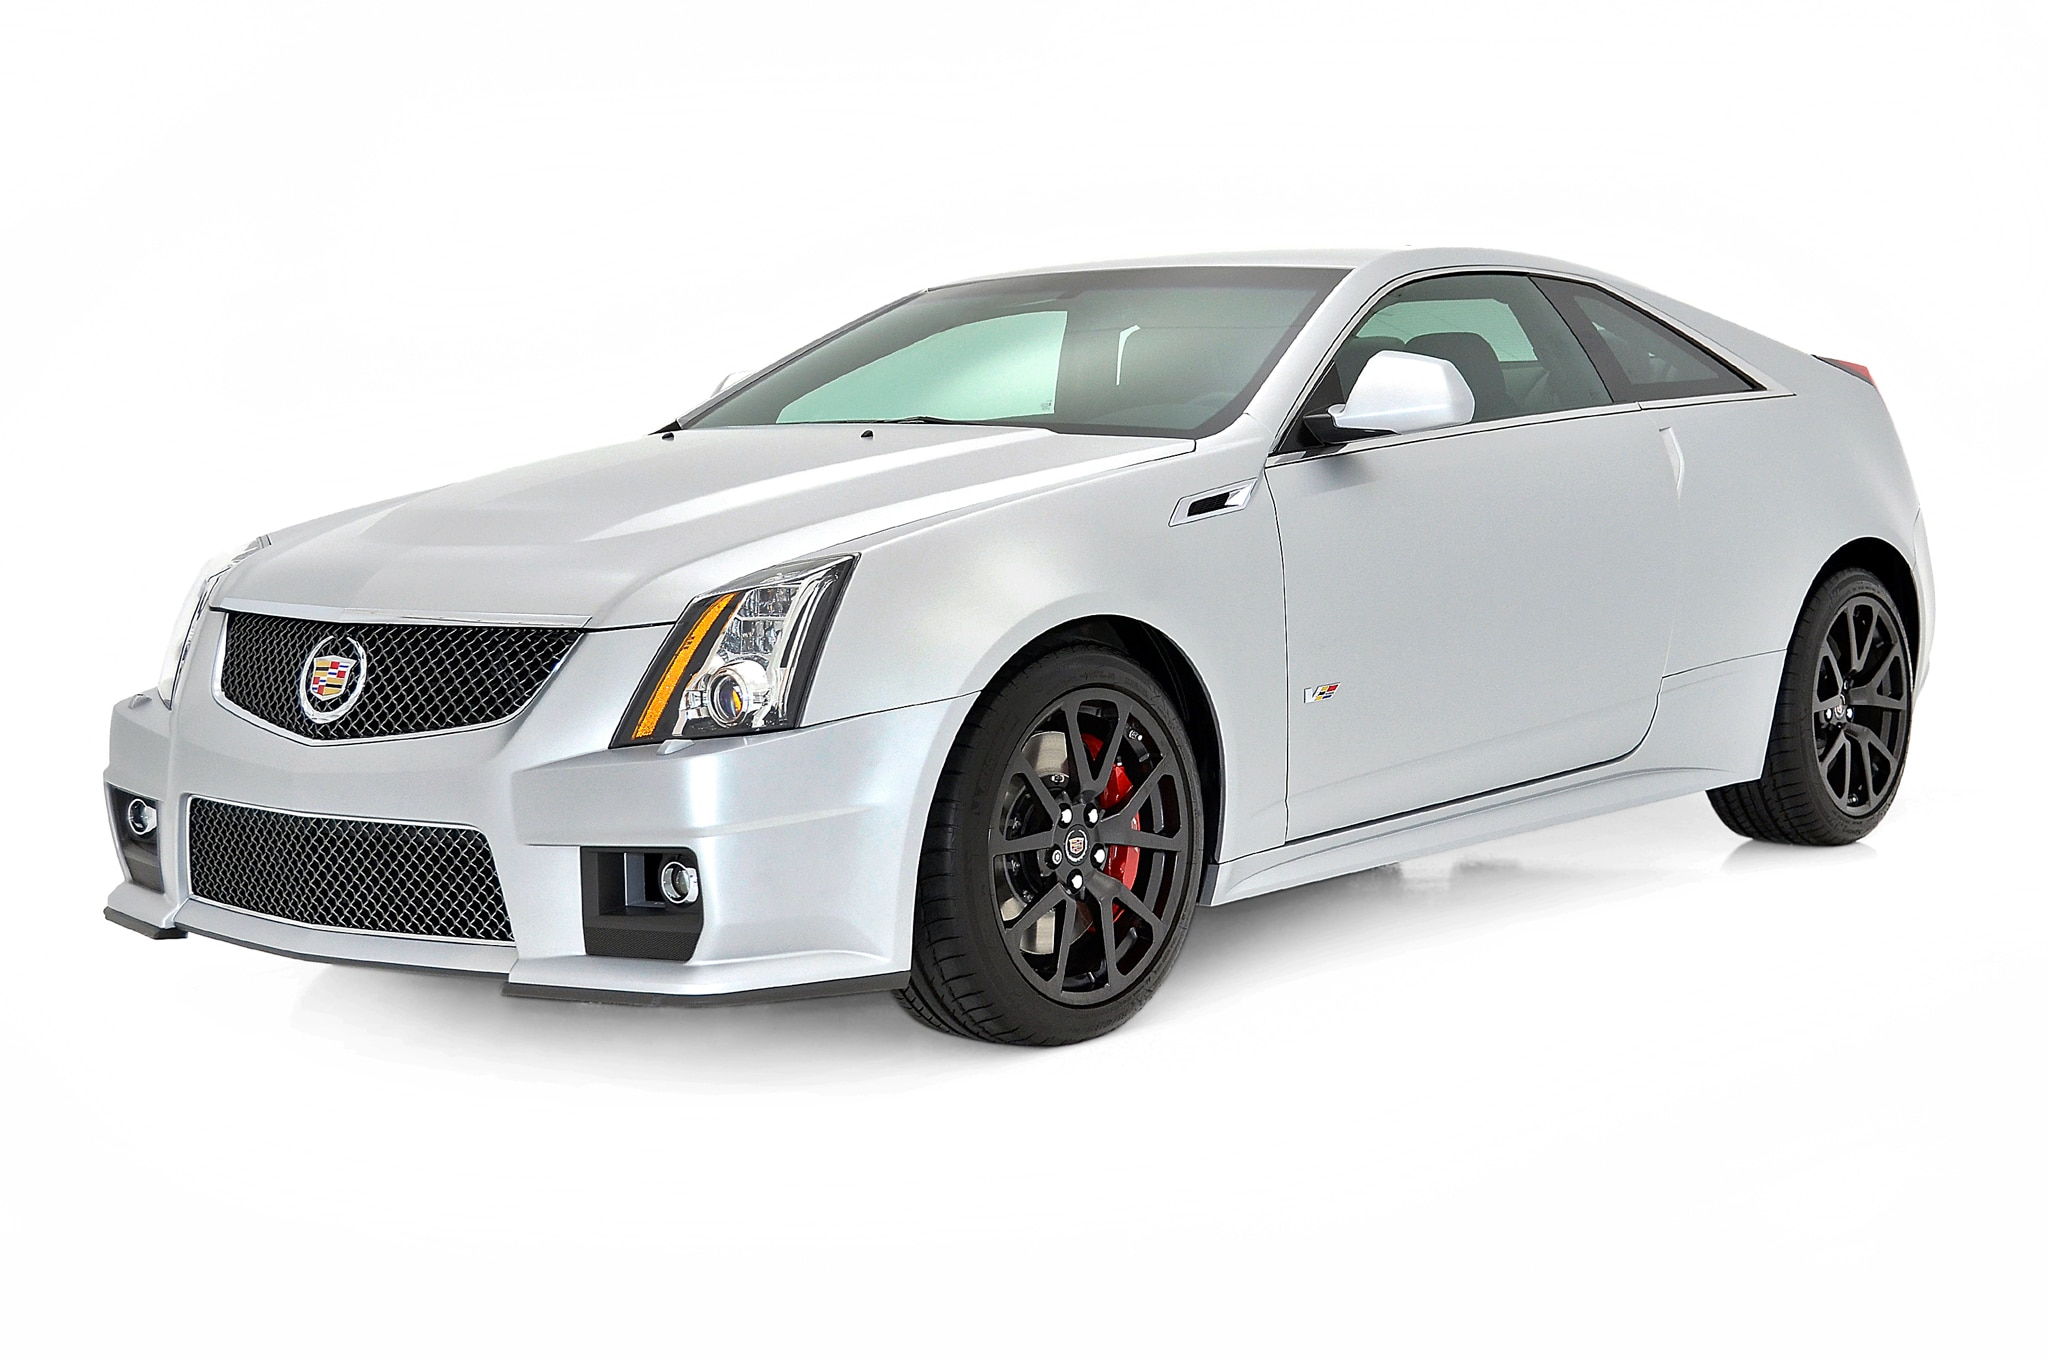 Two New Hues For New LimitedEdition Cadillac CTSV Models